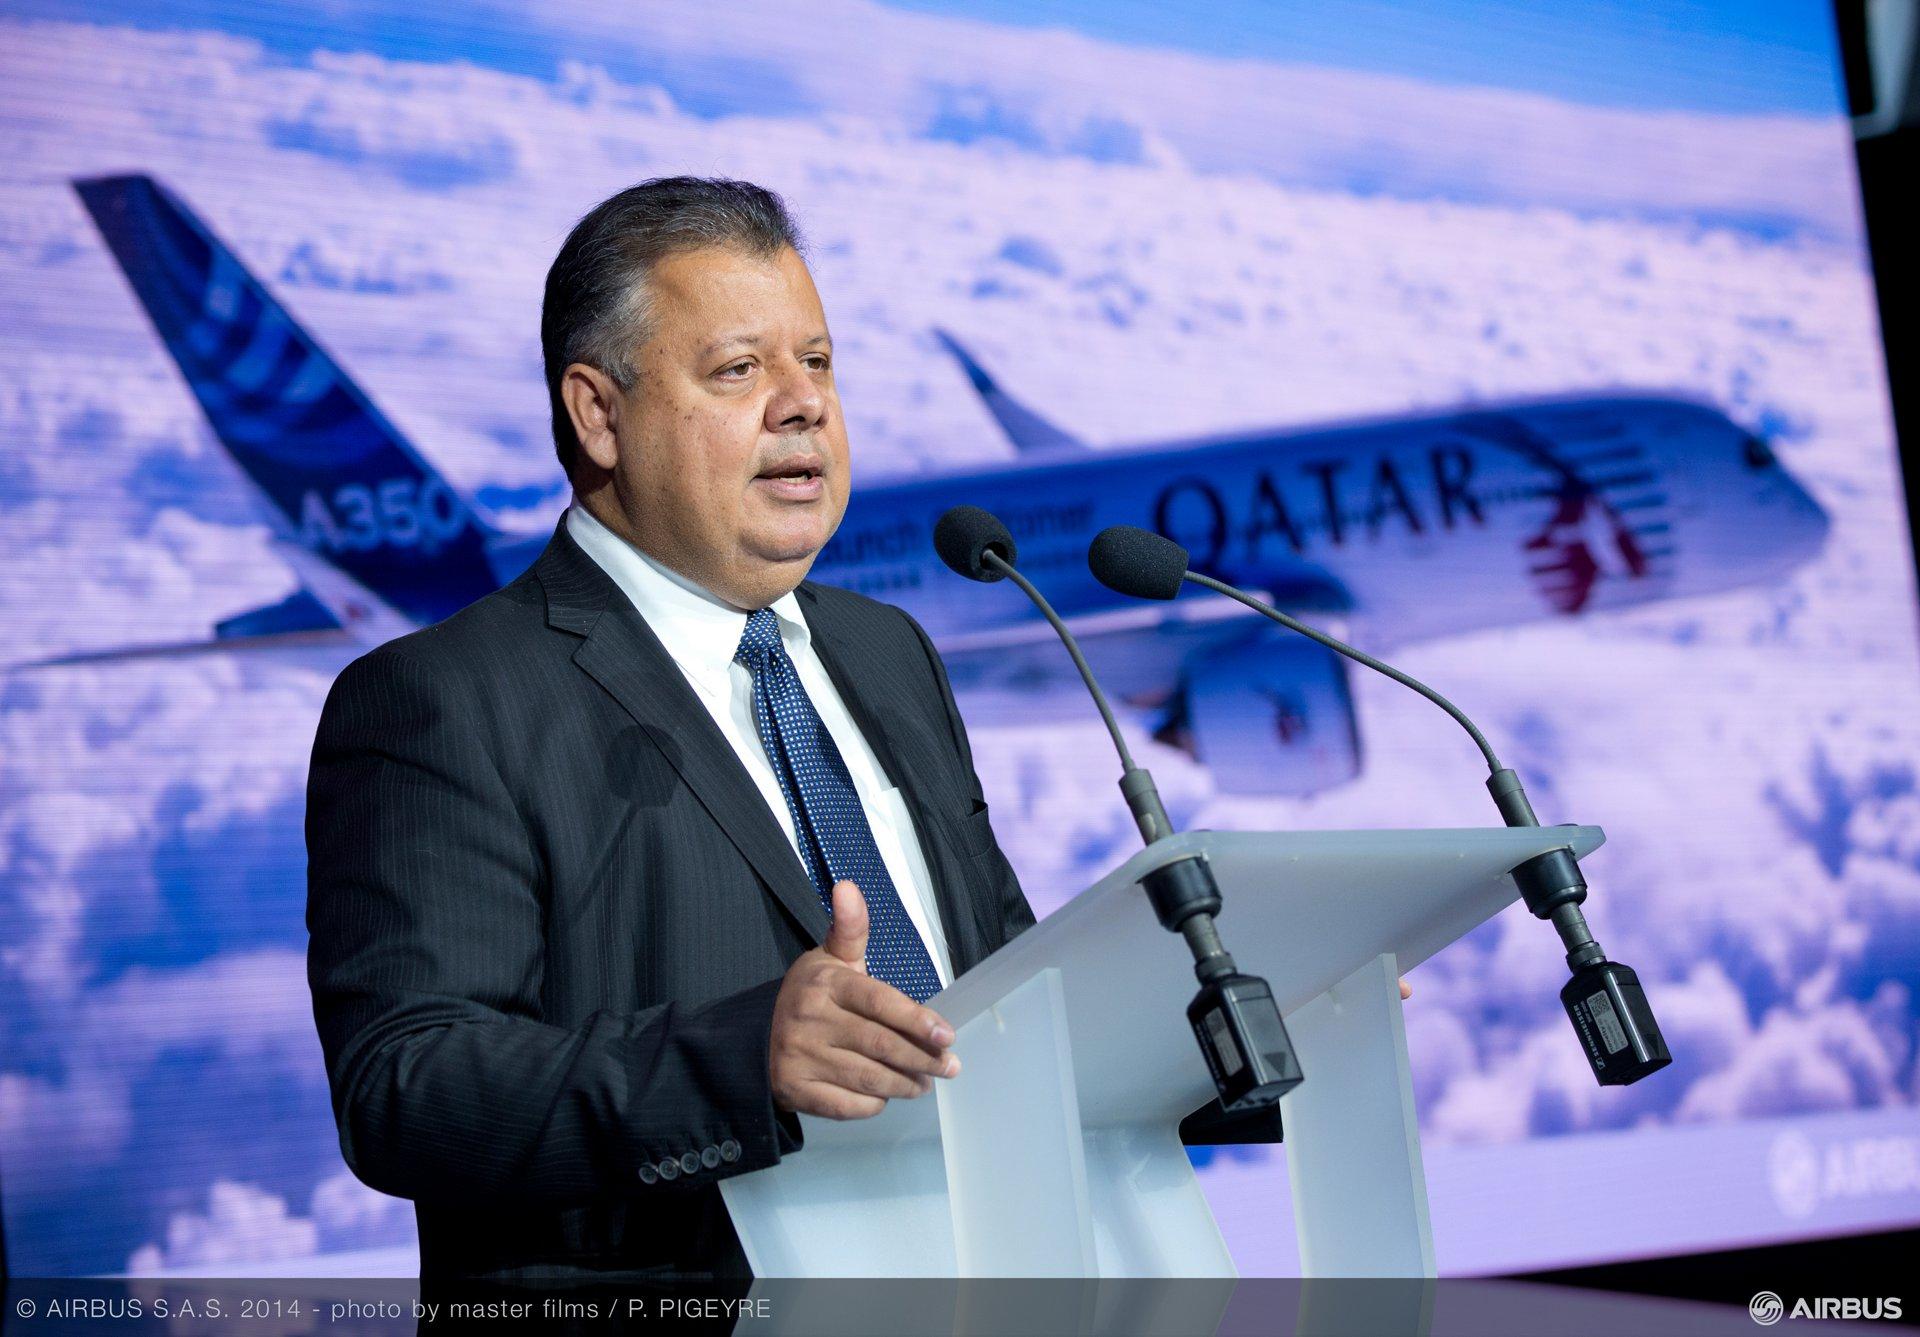 A350 XWB Qatar Airways first delivery - Kiran Rao briefing